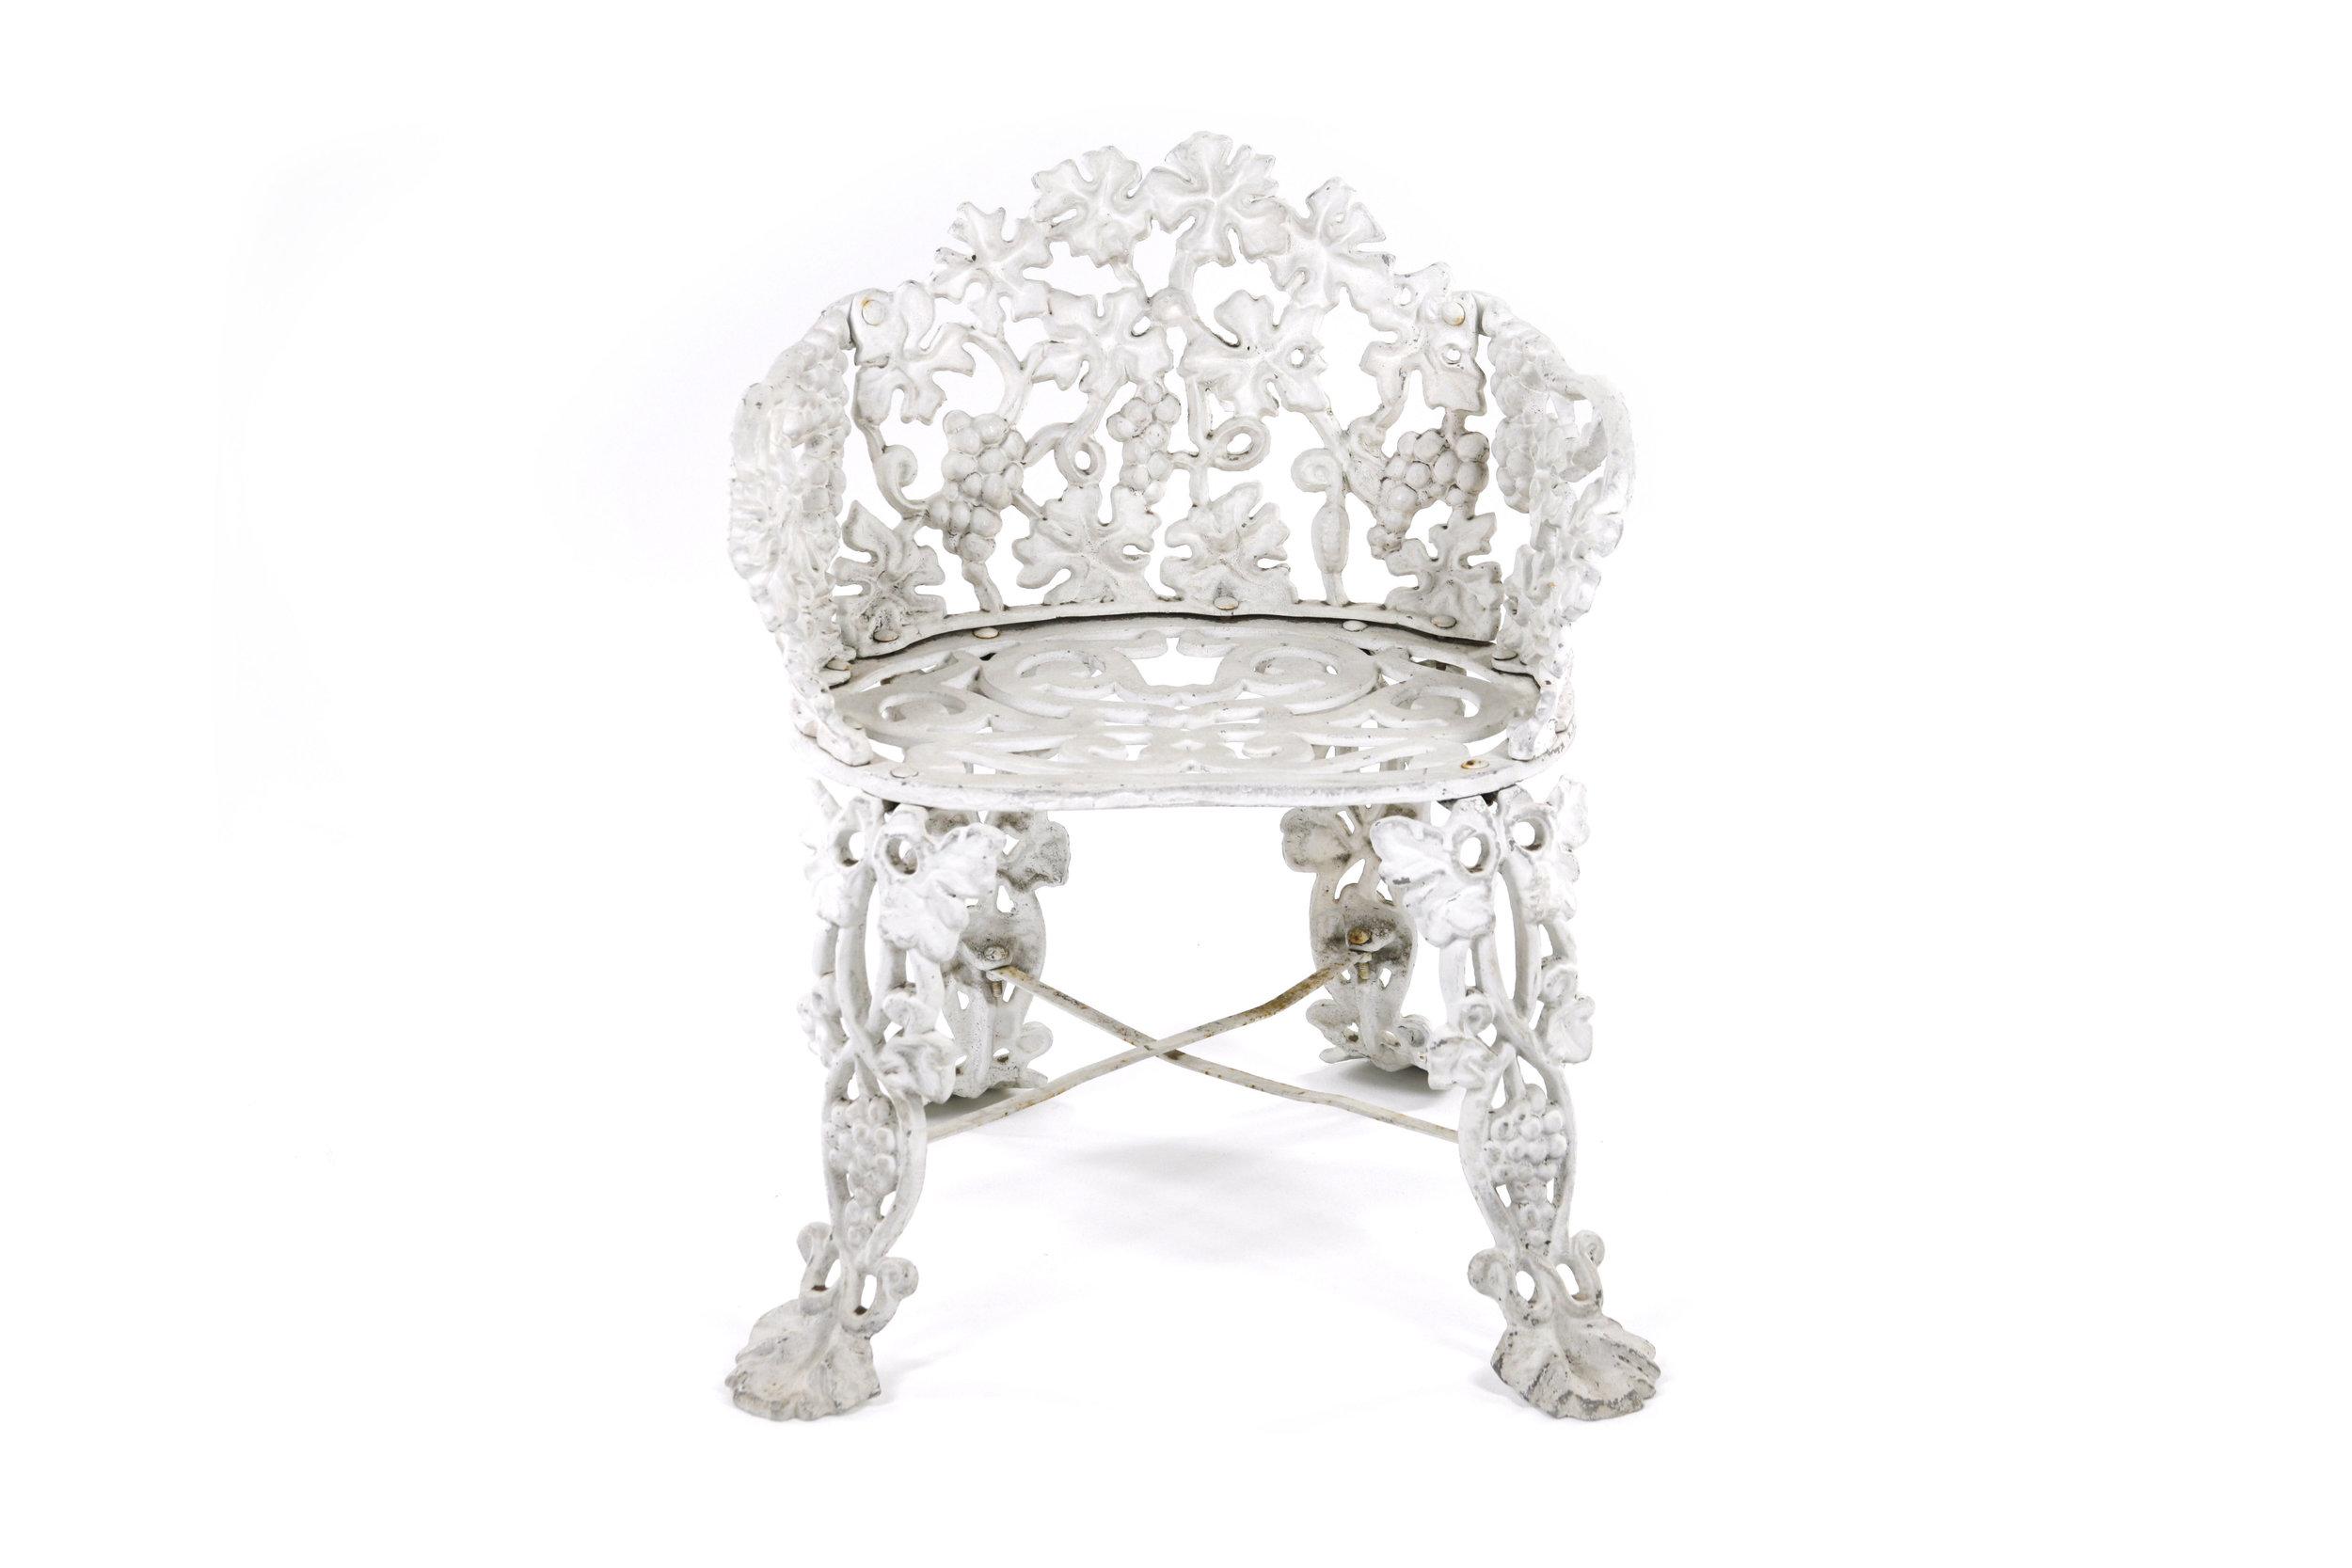 OrnateIronGardenFurniture_Chair3.jpg